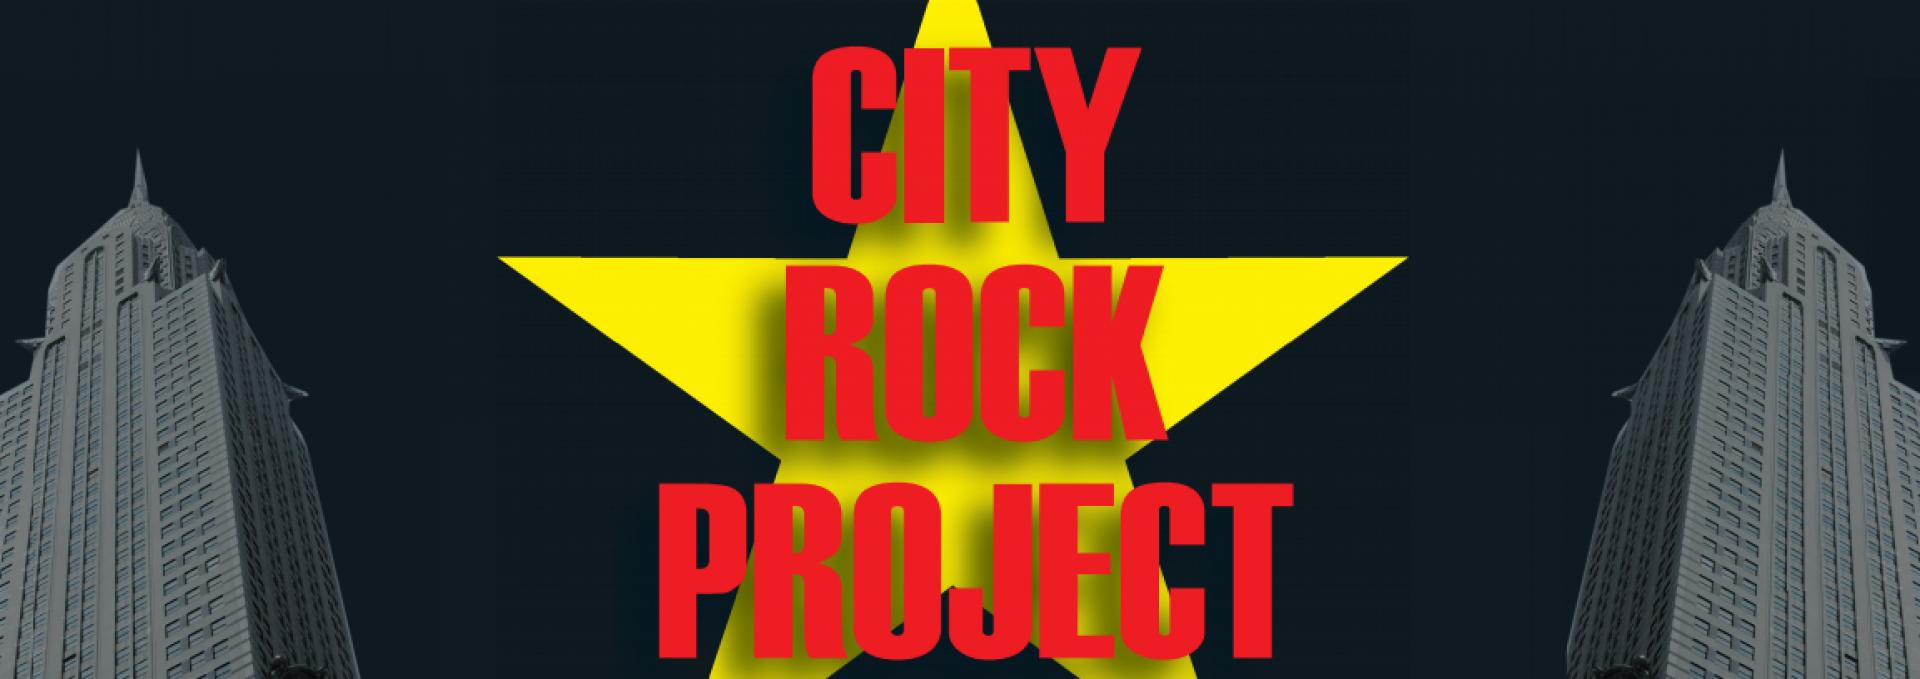 CityRock Project